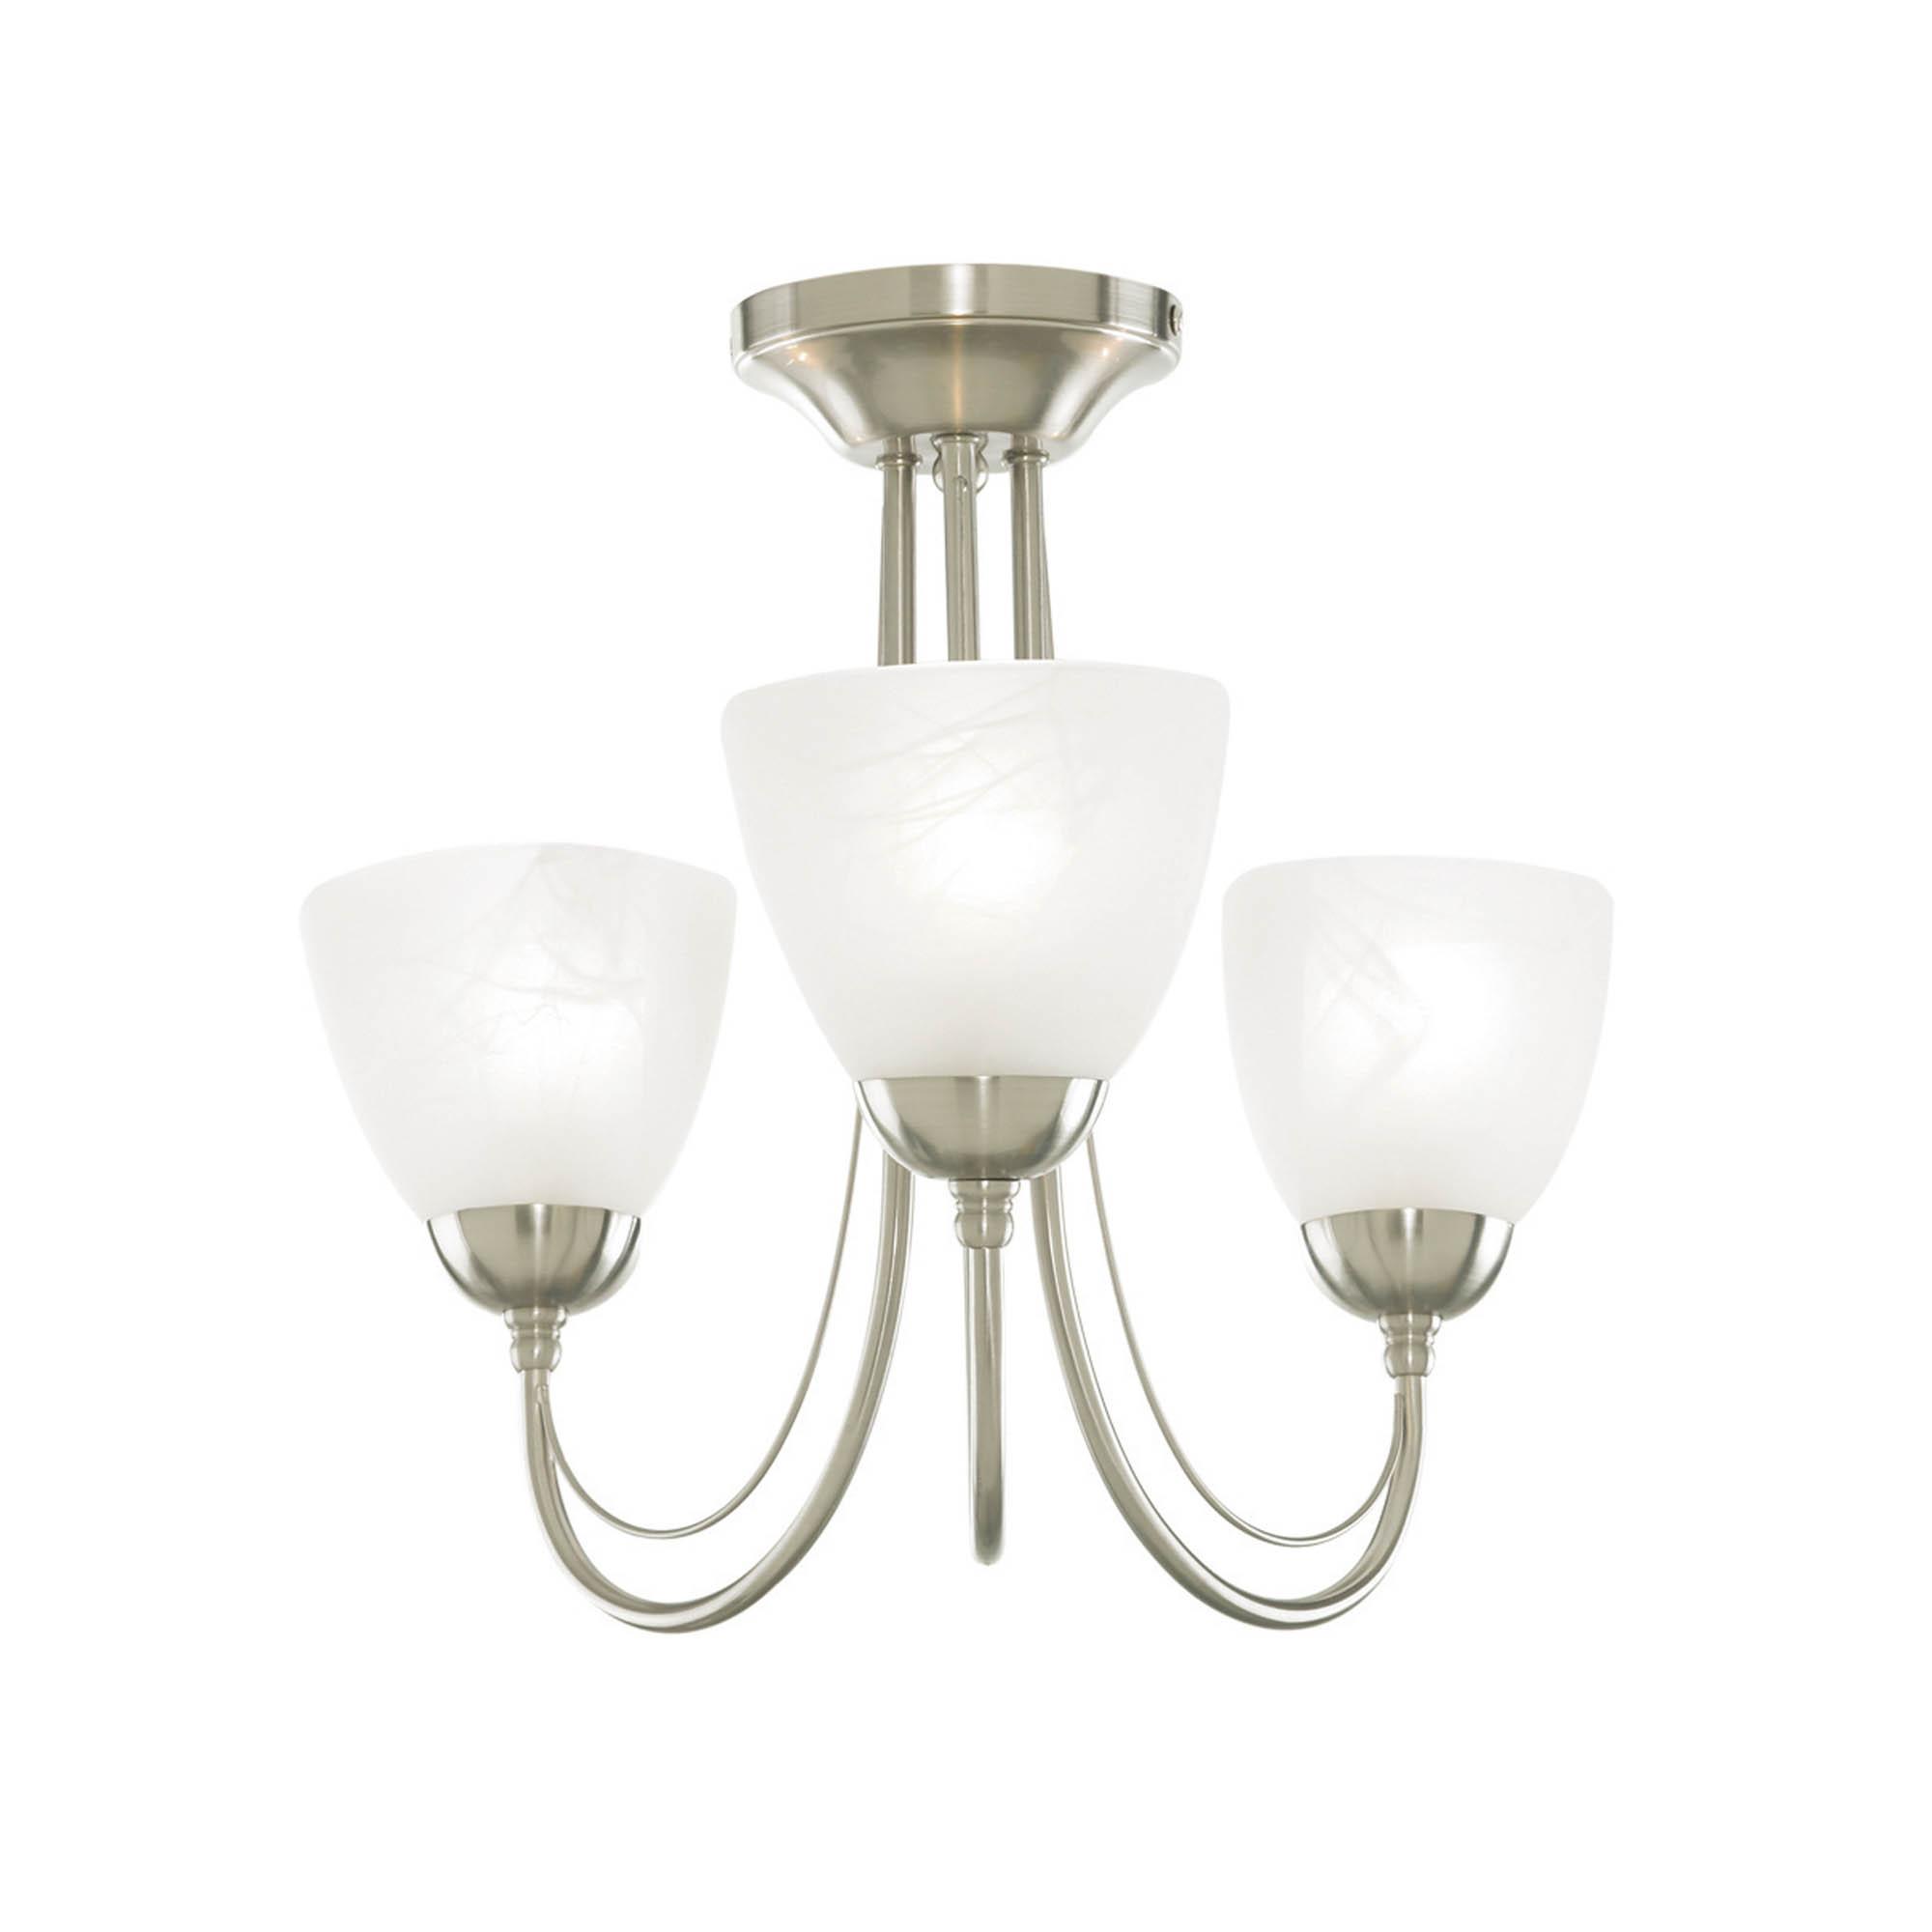 John Lewis Ceiling Lights Antique Brass : Antique brass ceiling light